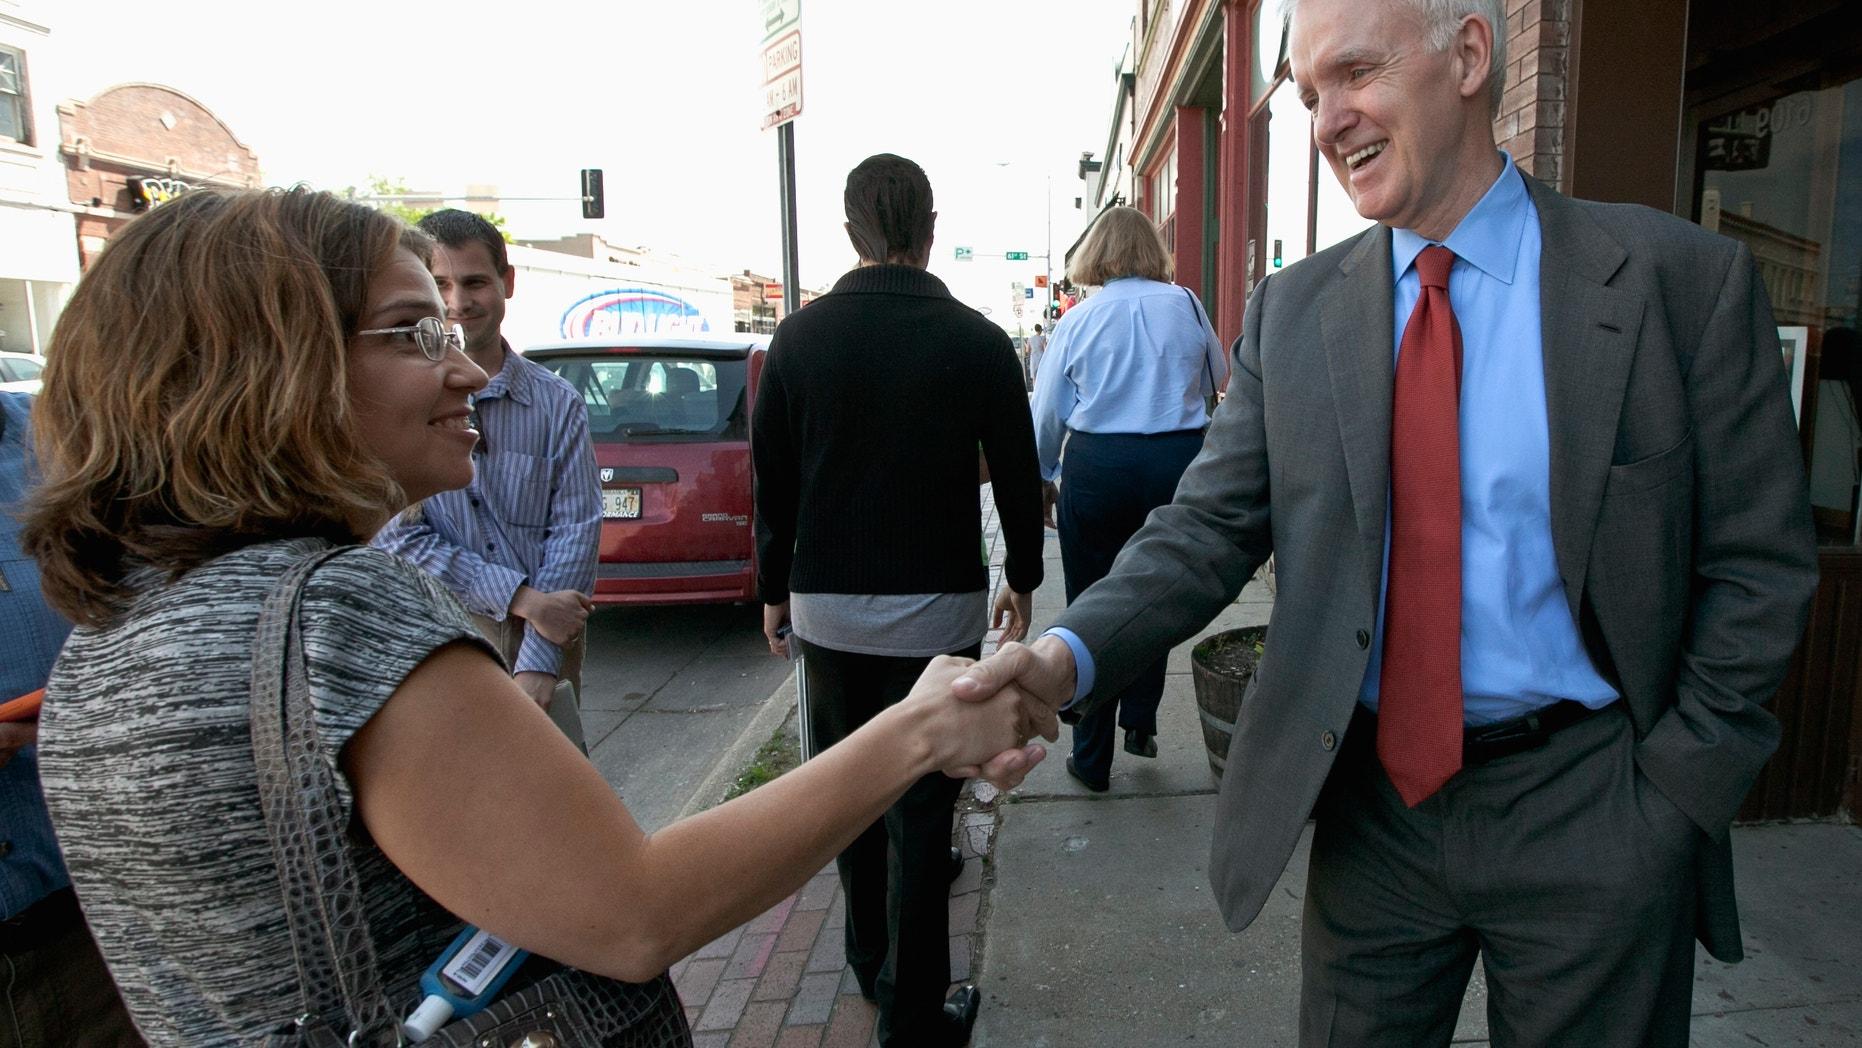 May 15, 2012: Democratic senate candidate Bob Kerrey campaigns in the Benson neighborhood of Omaha, Neb.